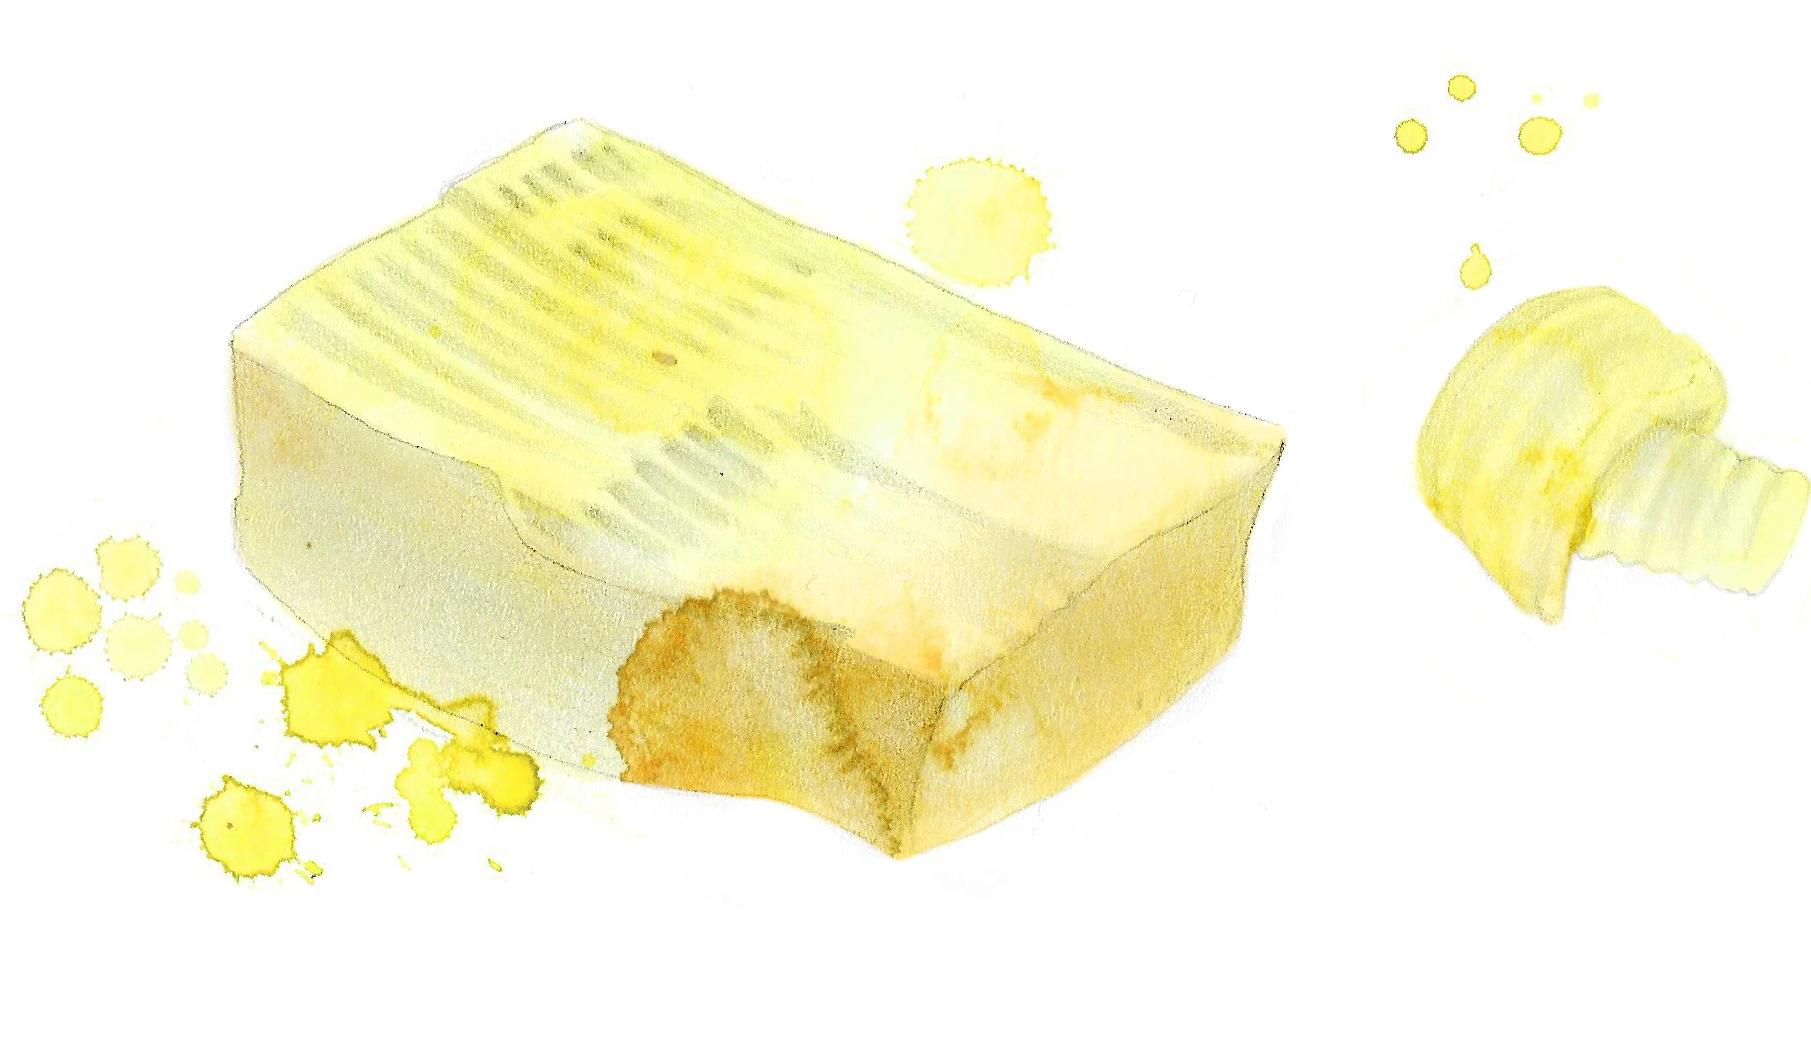 OMG Beurre Blanc!